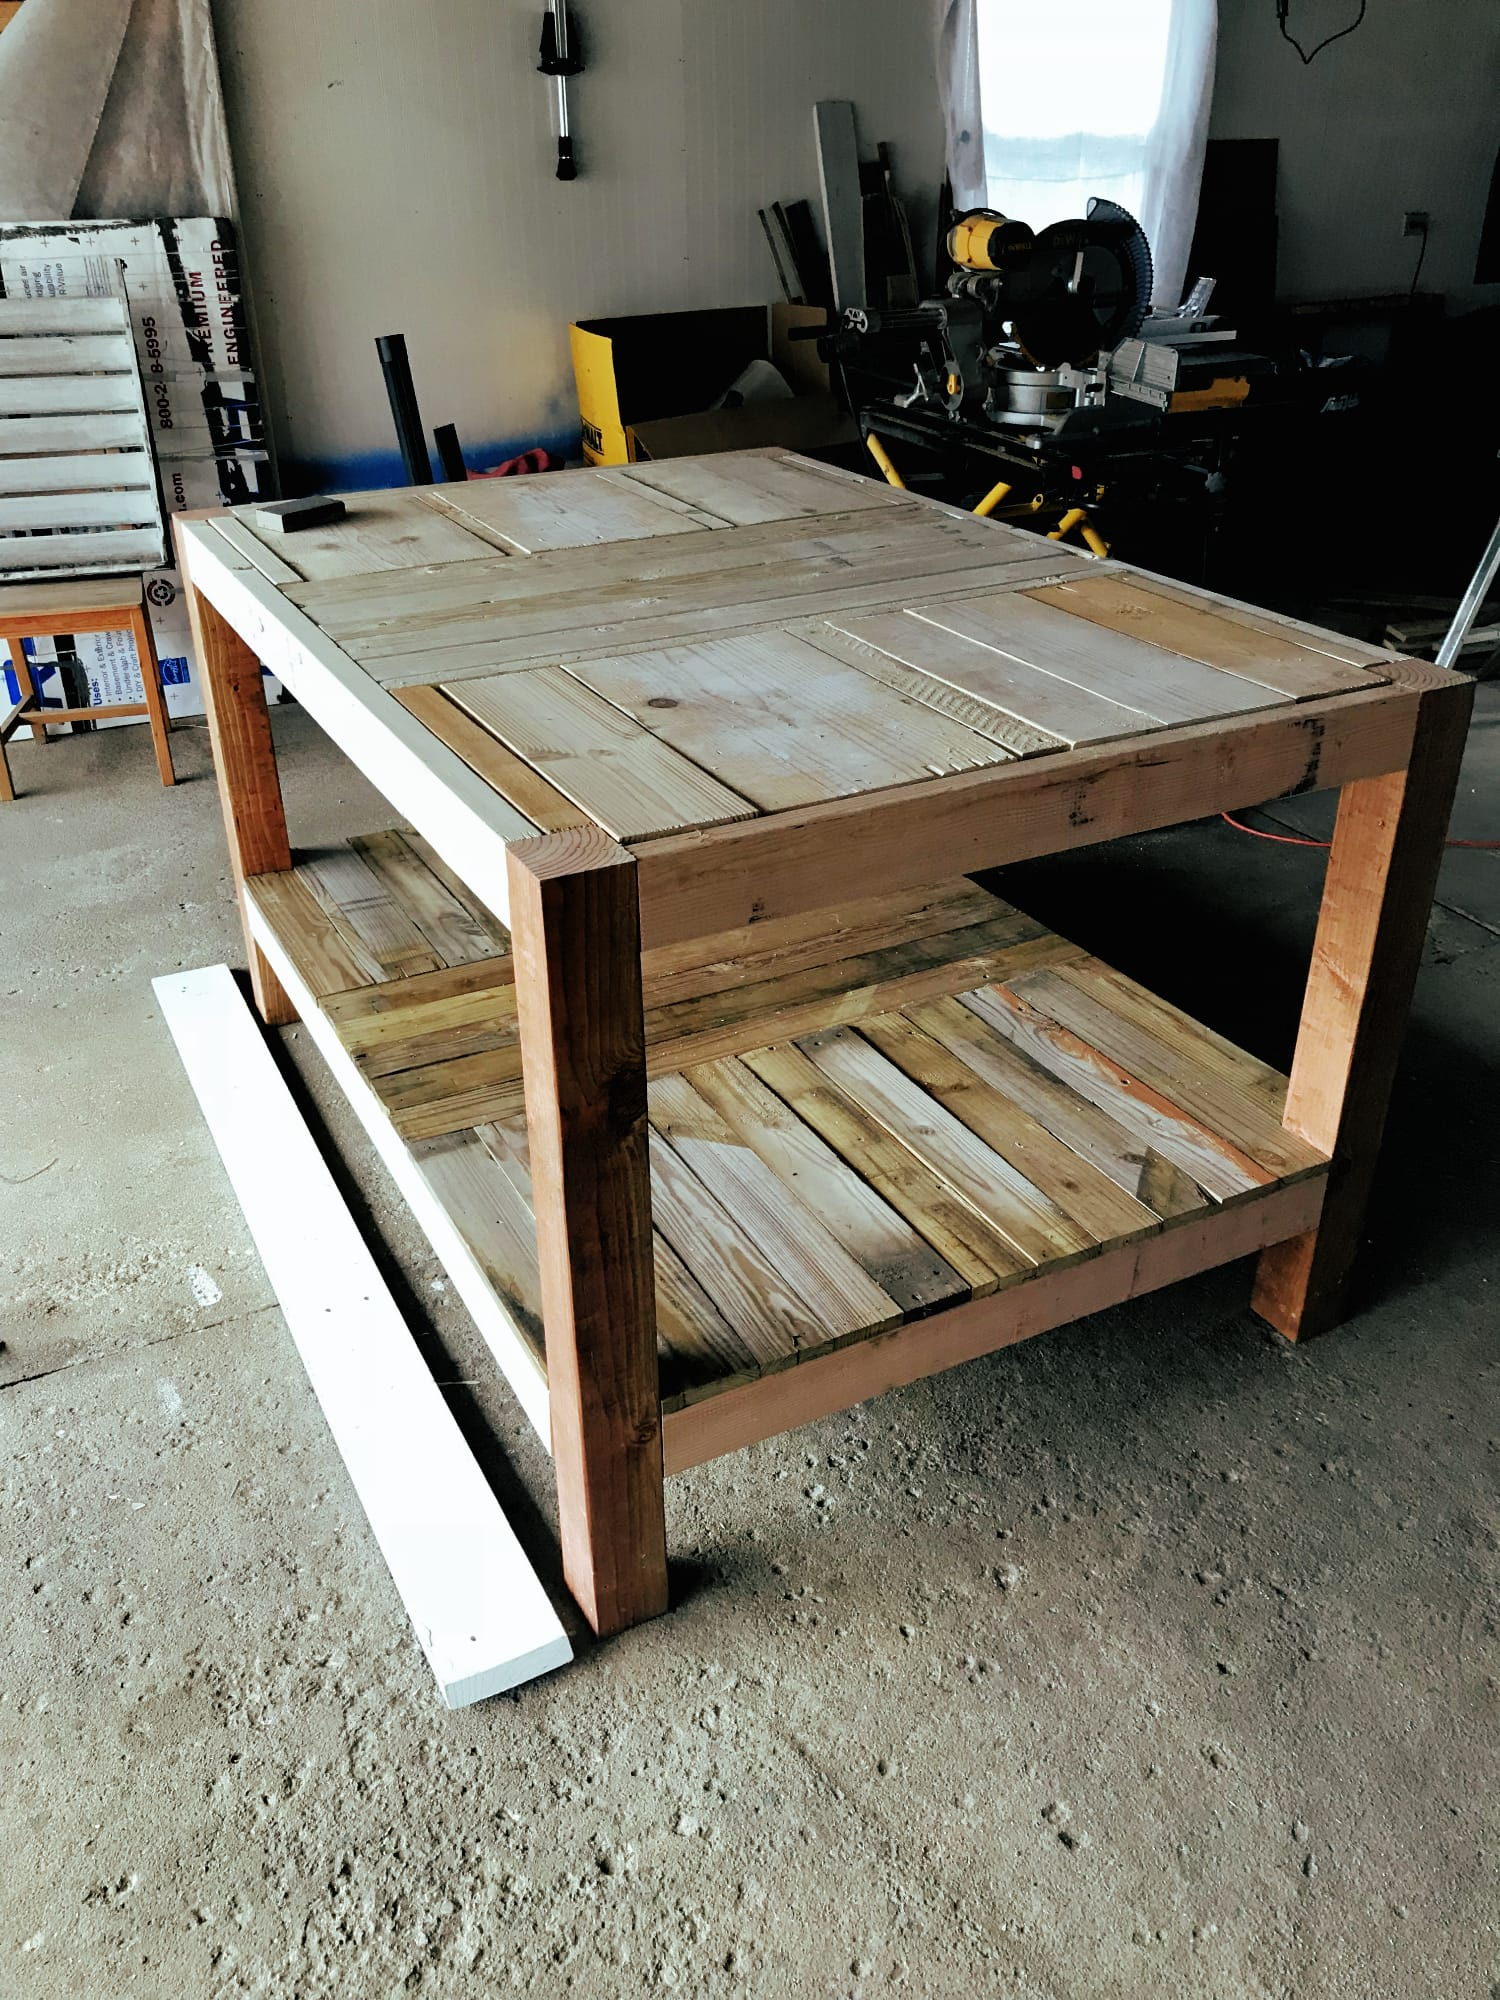 Building My First Workbench Samantha Ebreo